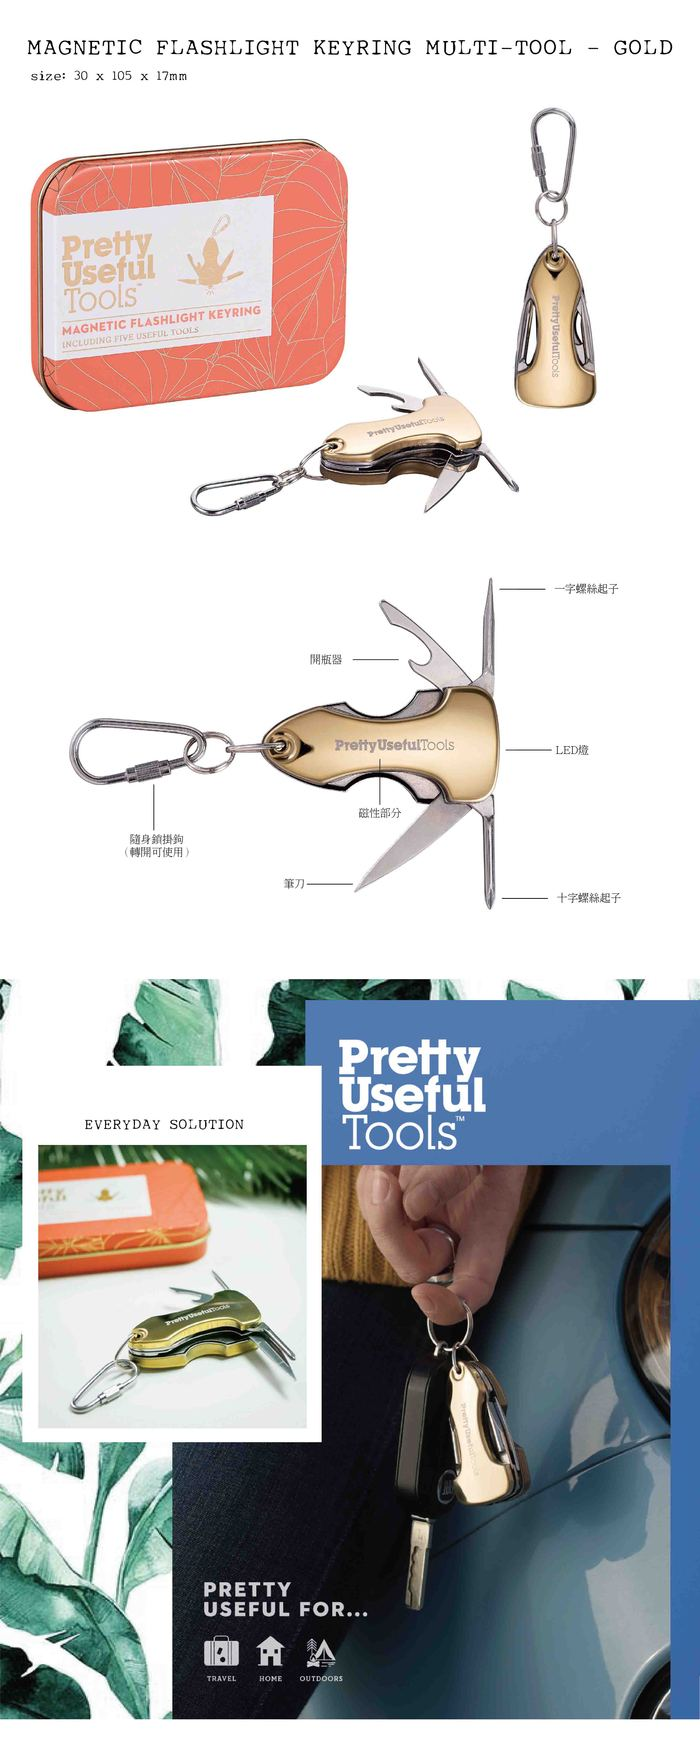 (複製)Pretty Useful Tools|隨身LED多功能手電筒 - 金色